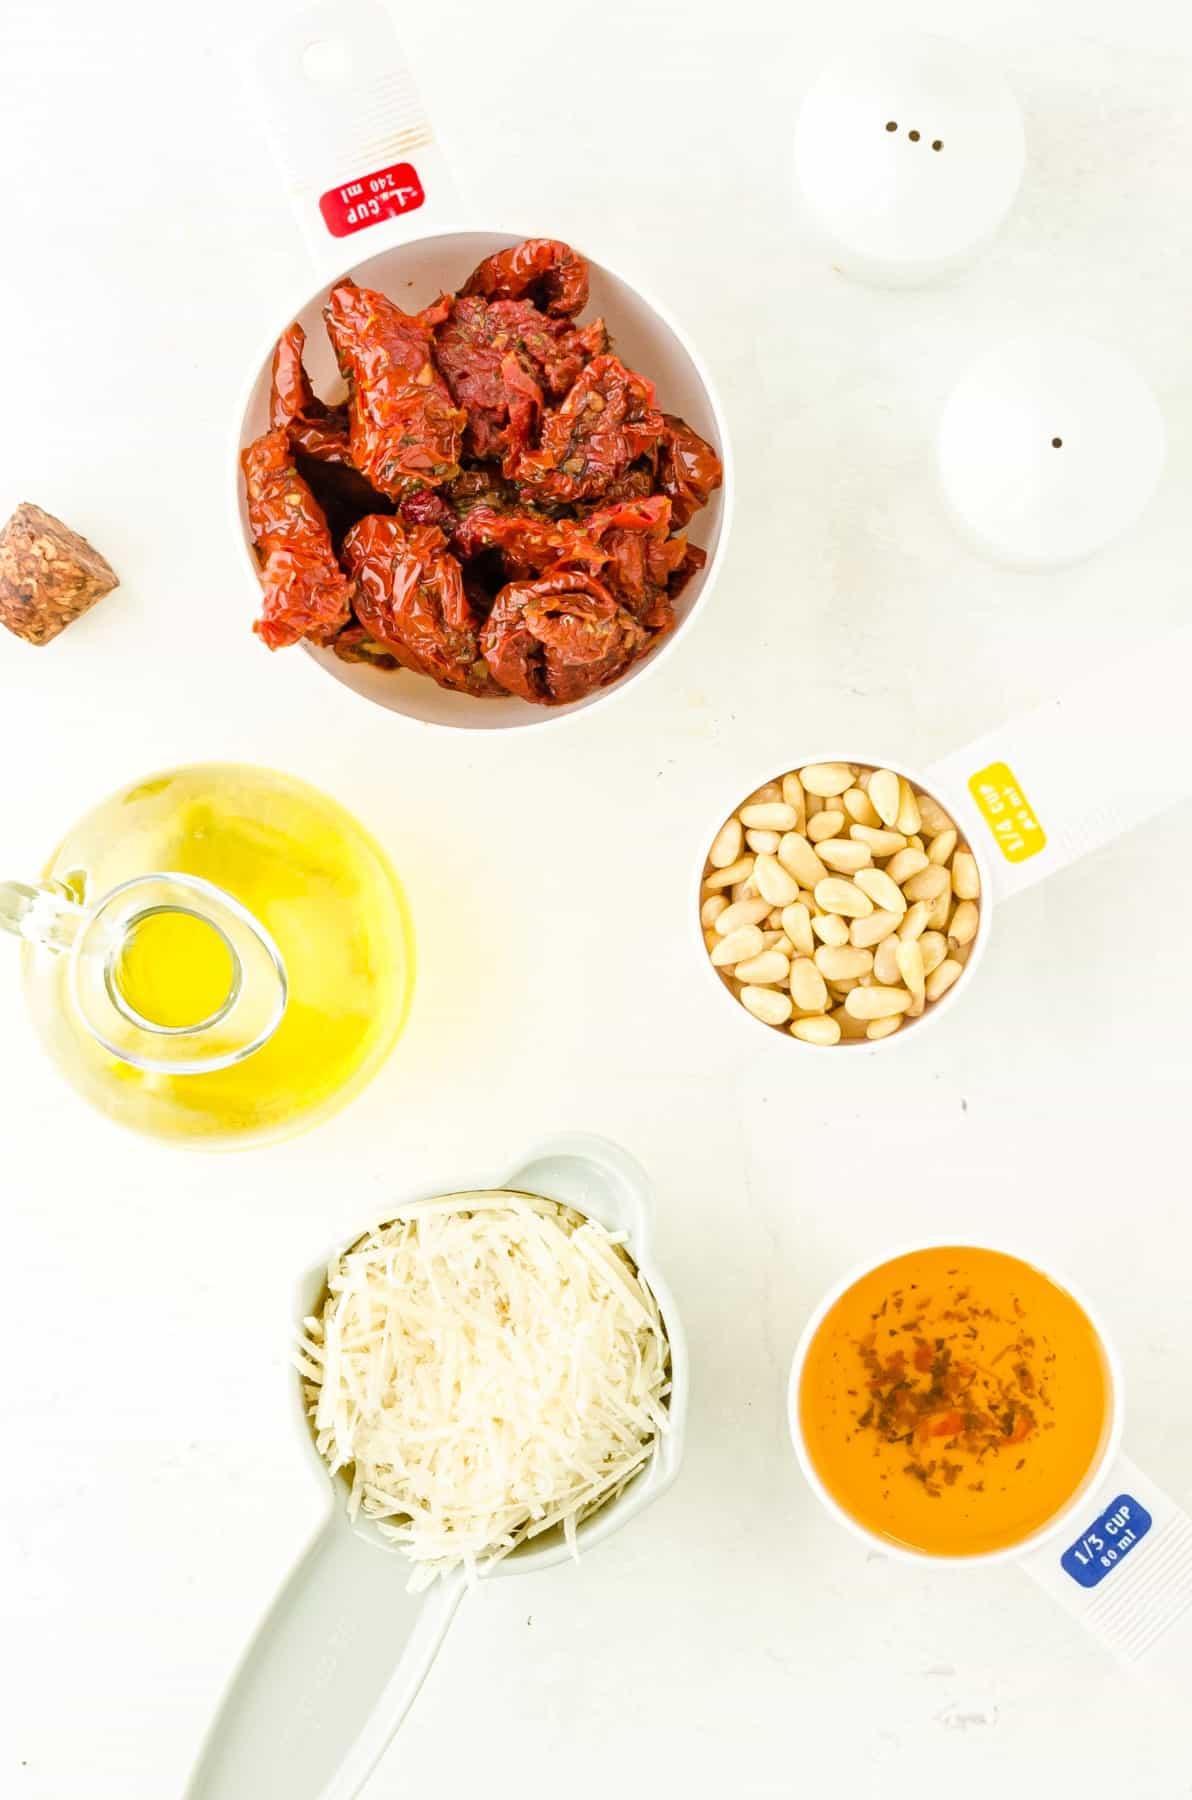 Ingredients for Sundried Tomato Red Pesto or Pesto Rosso